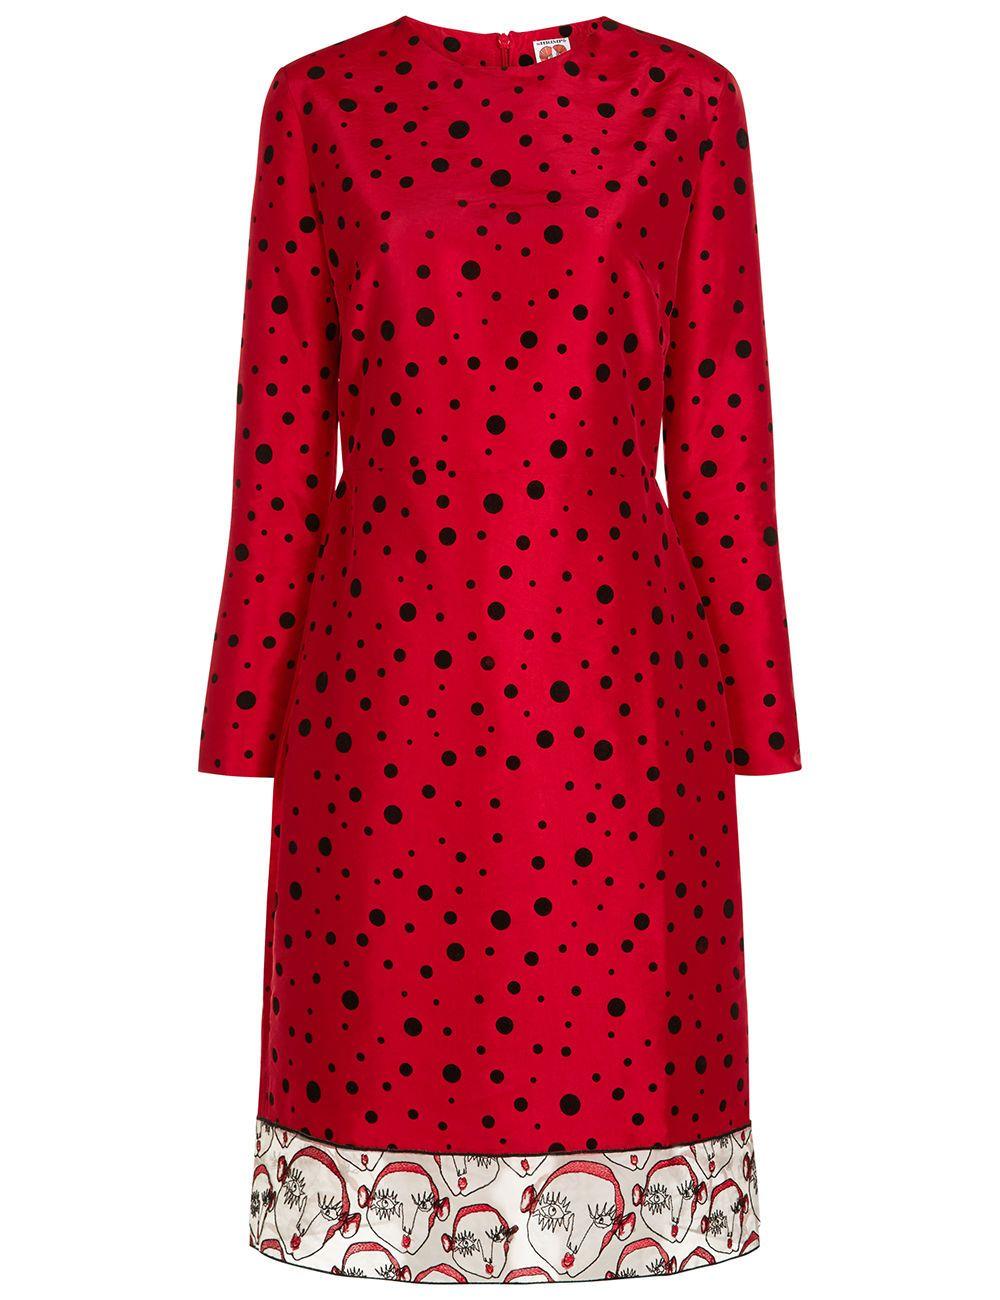 Shrimps red taffeta polka dot gisele dress shrimps cloth dress